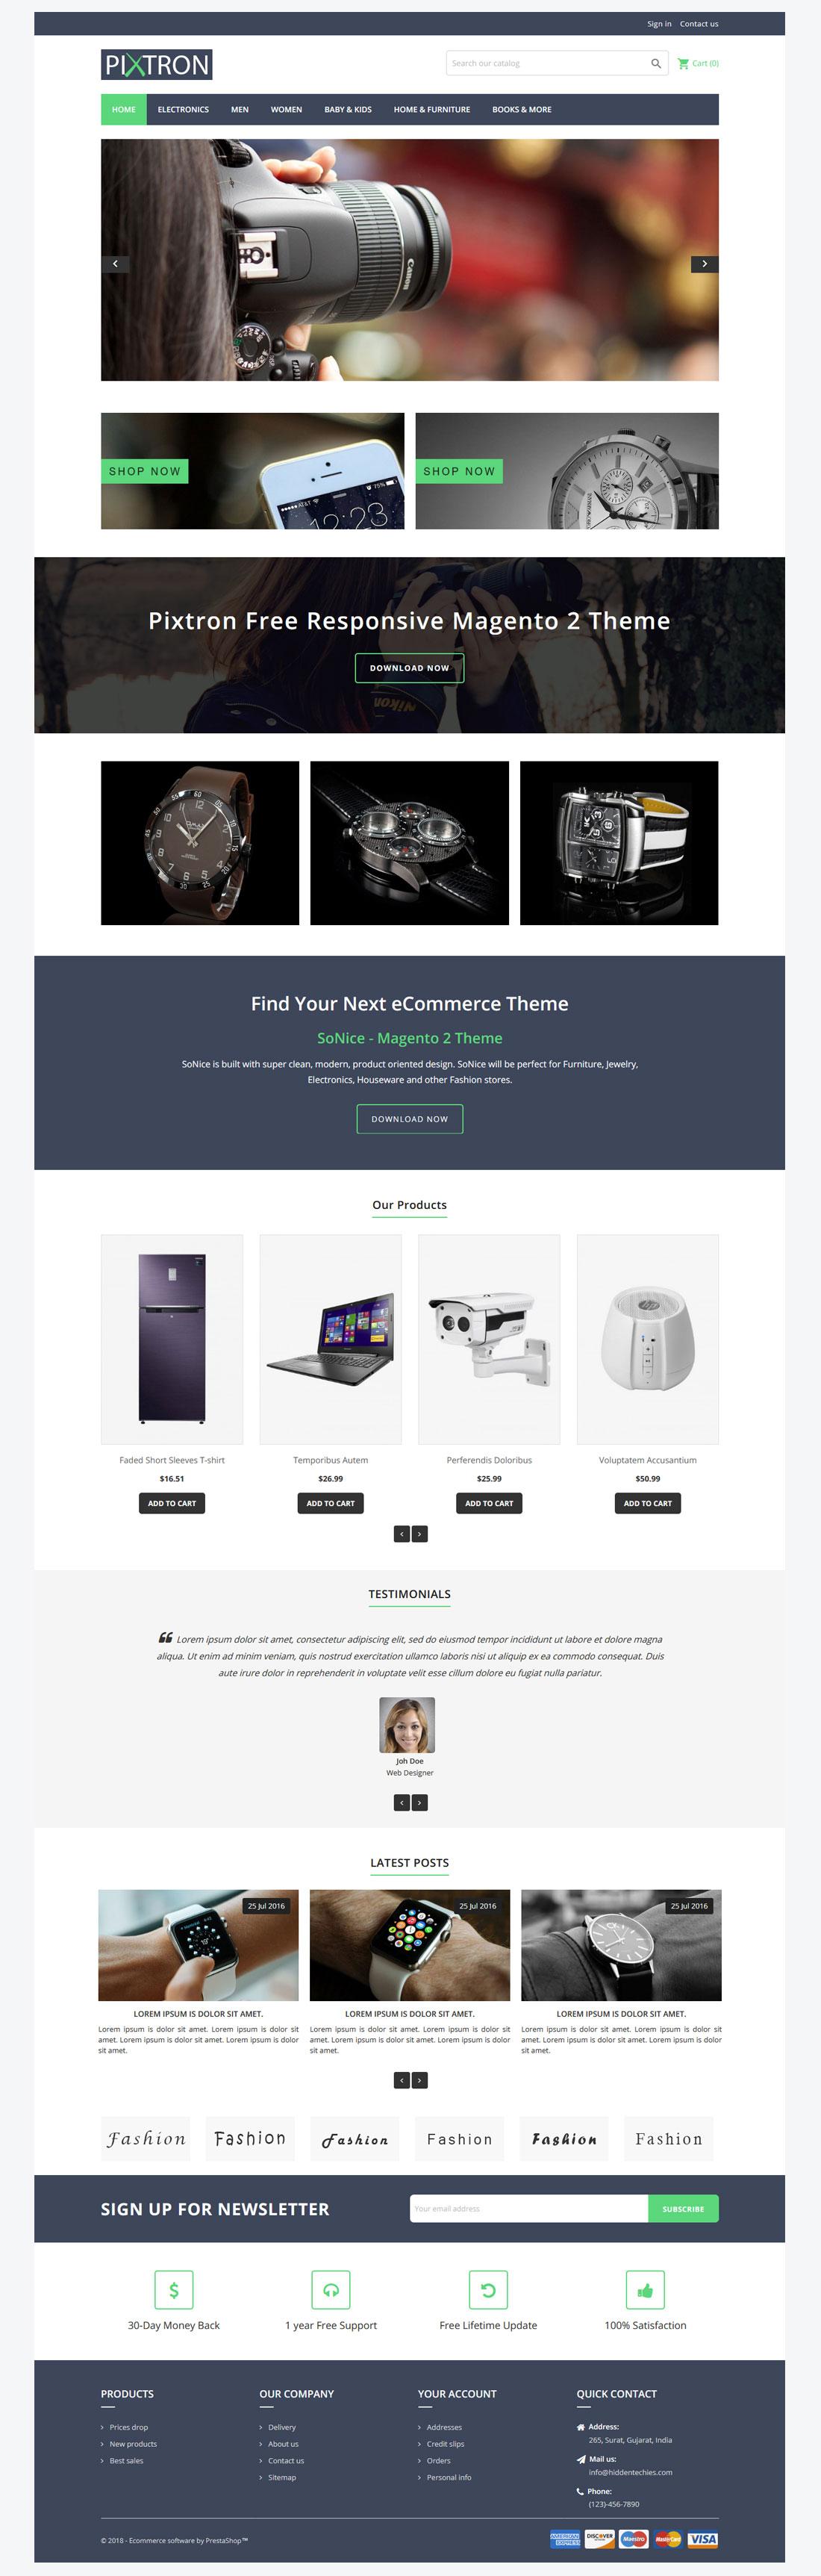 Prestashop Free & Premium Themes